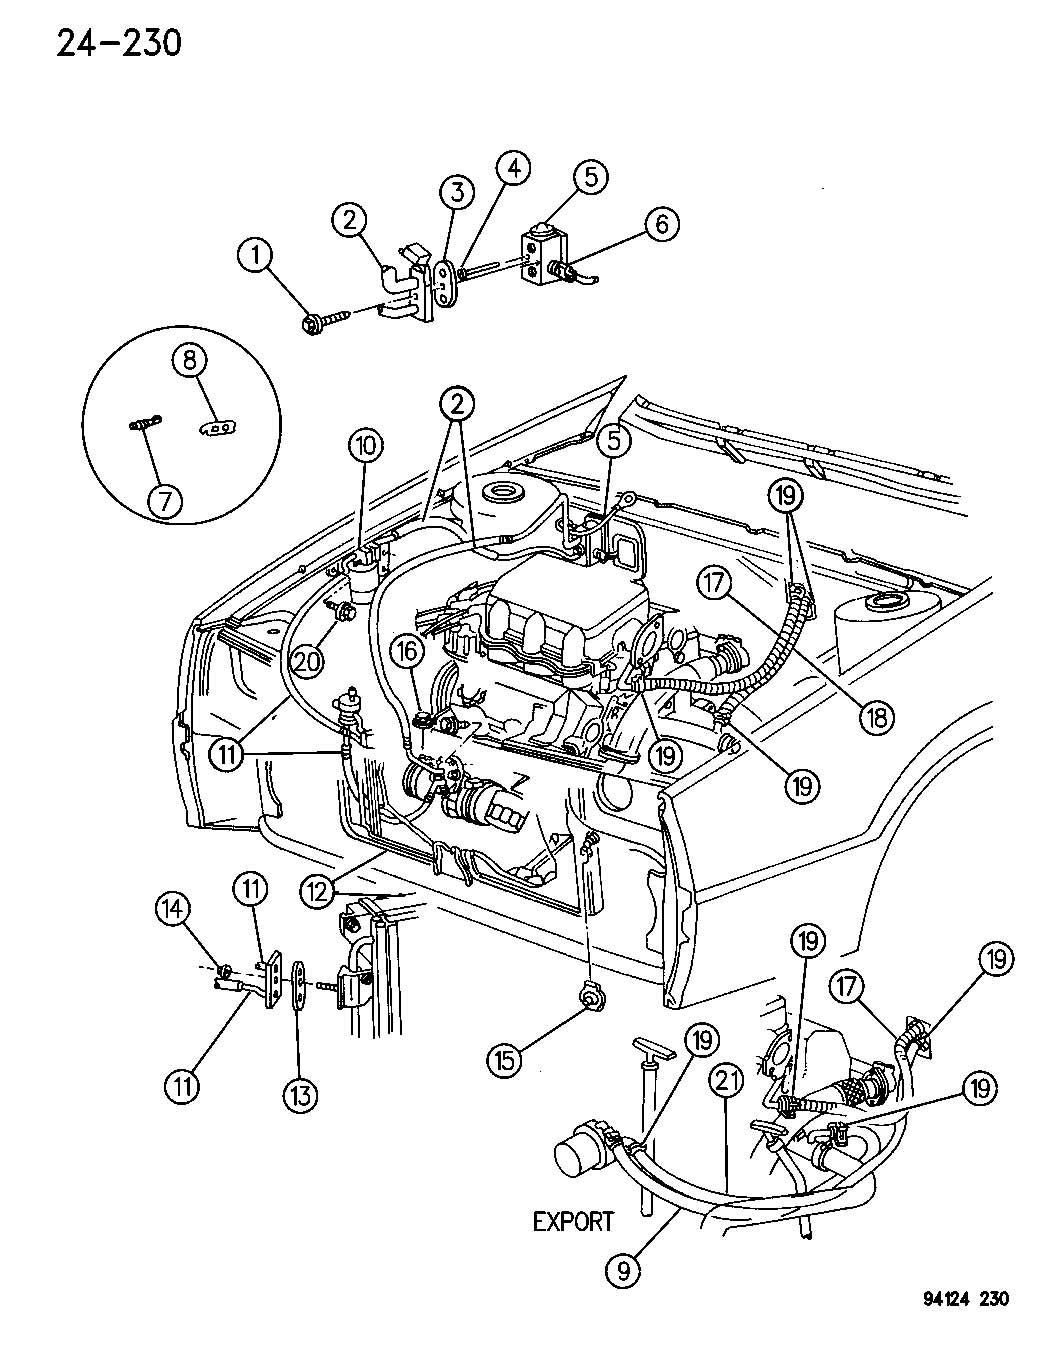 1995 Dodge Valve. A/c expansion. Abody, illustrations